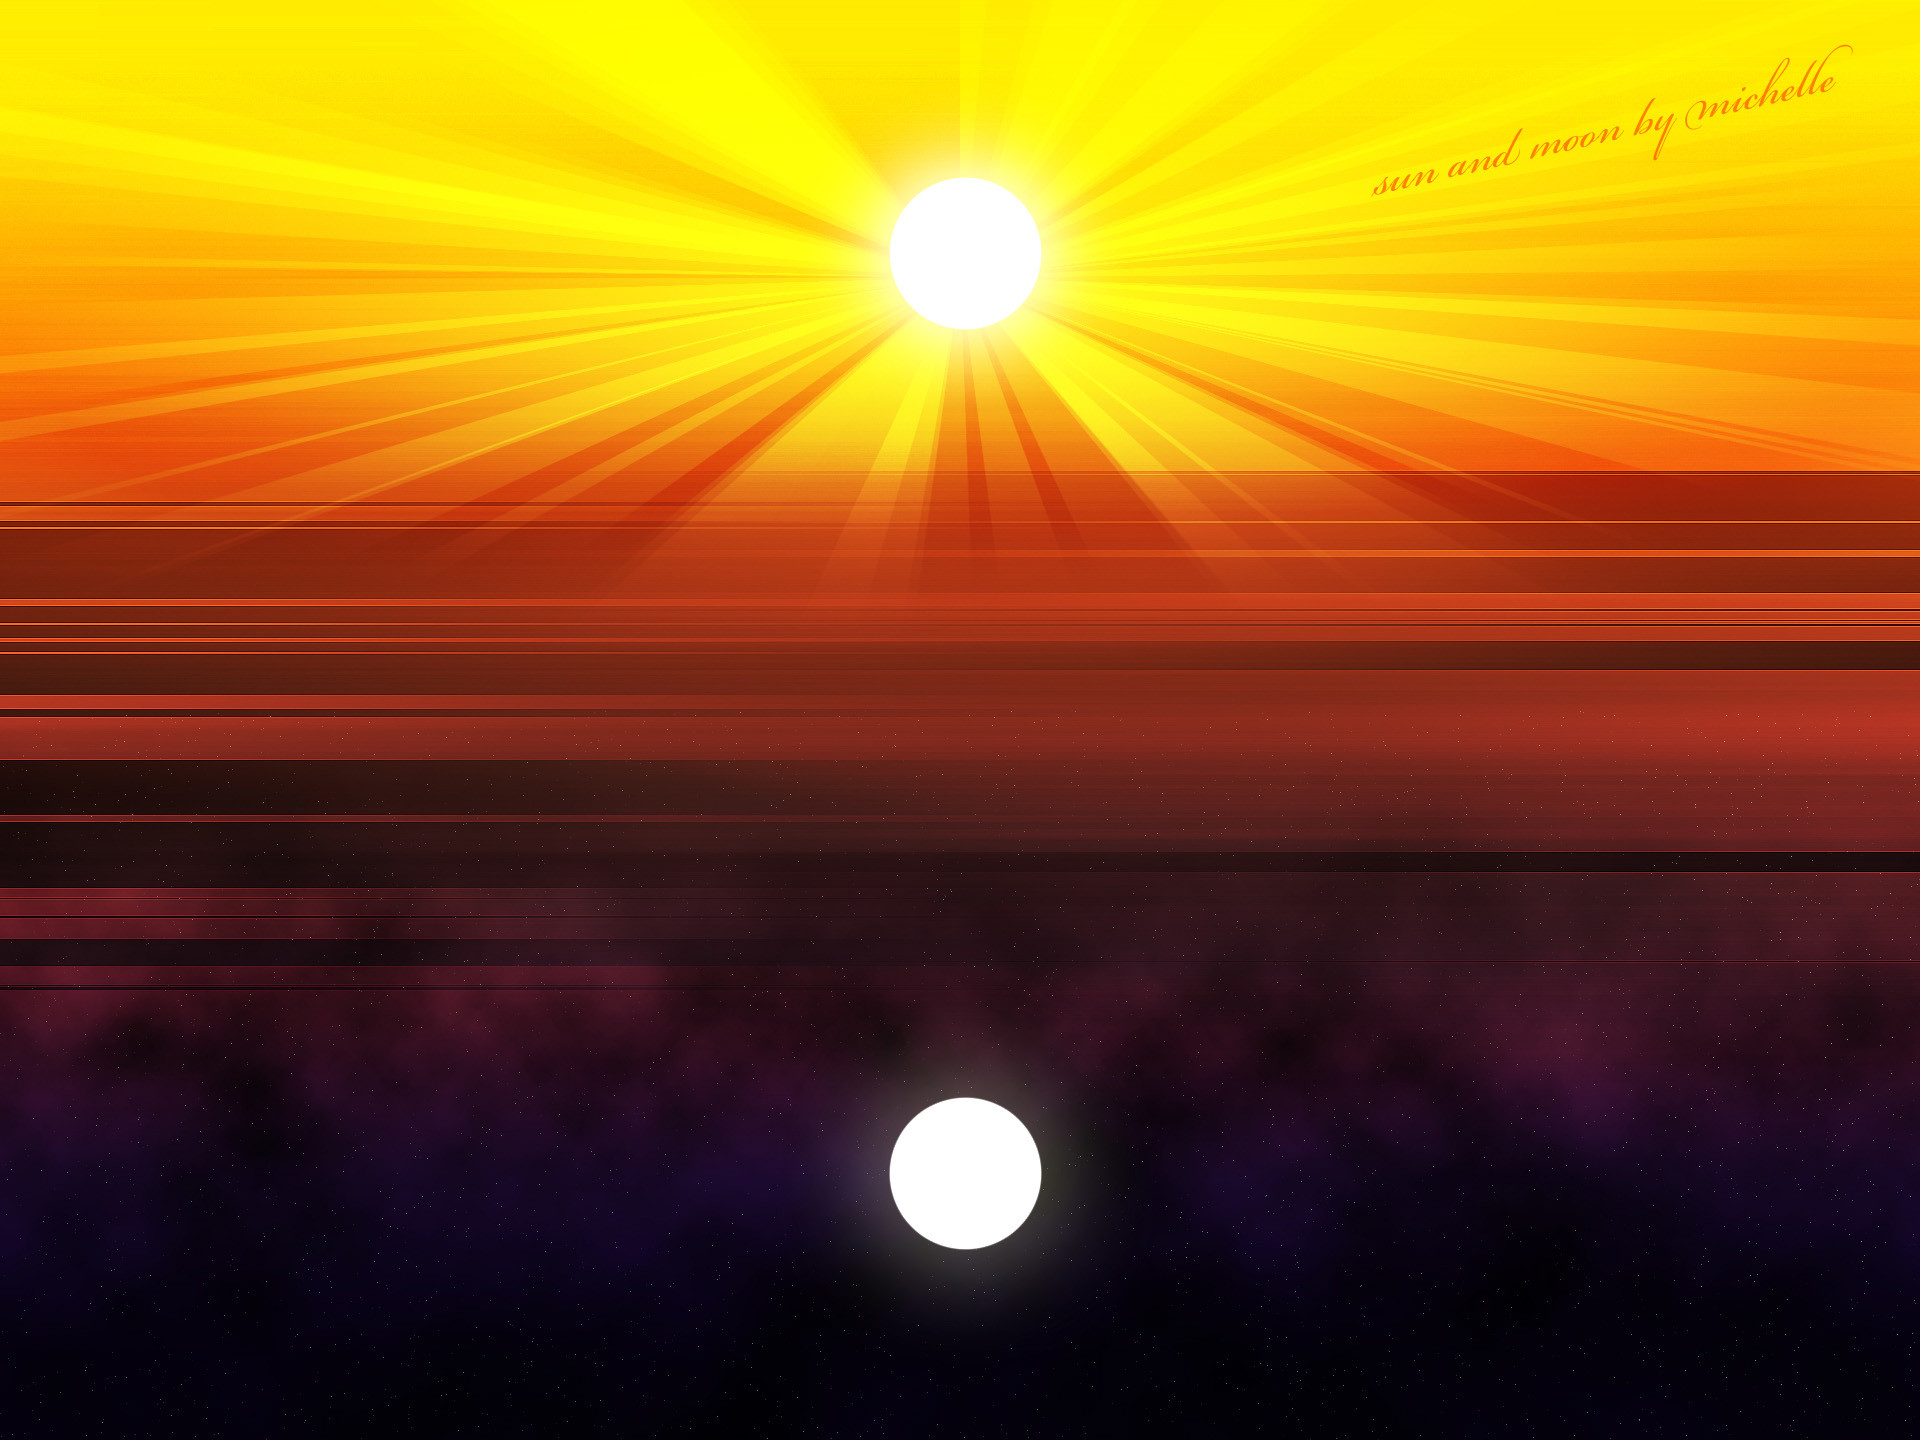 Sun Moon Background by hearttaco on DeviantArt